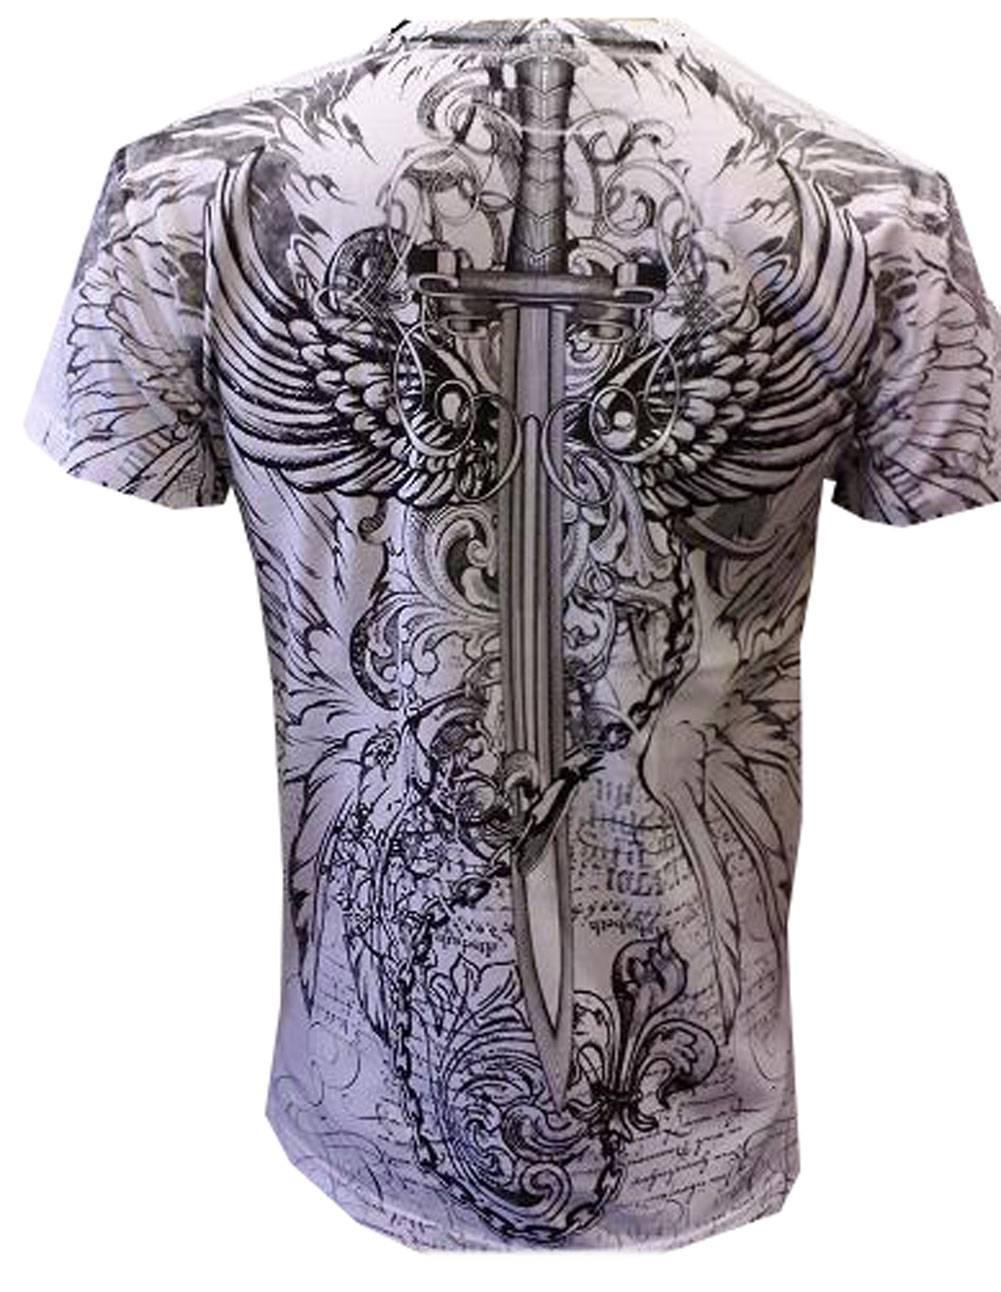 Konflic-NWT-Men-039-s-Eagle-Defender-Graphic-Designer-MMA-Muscle-Crewneck-T-shirt thumbnail 8